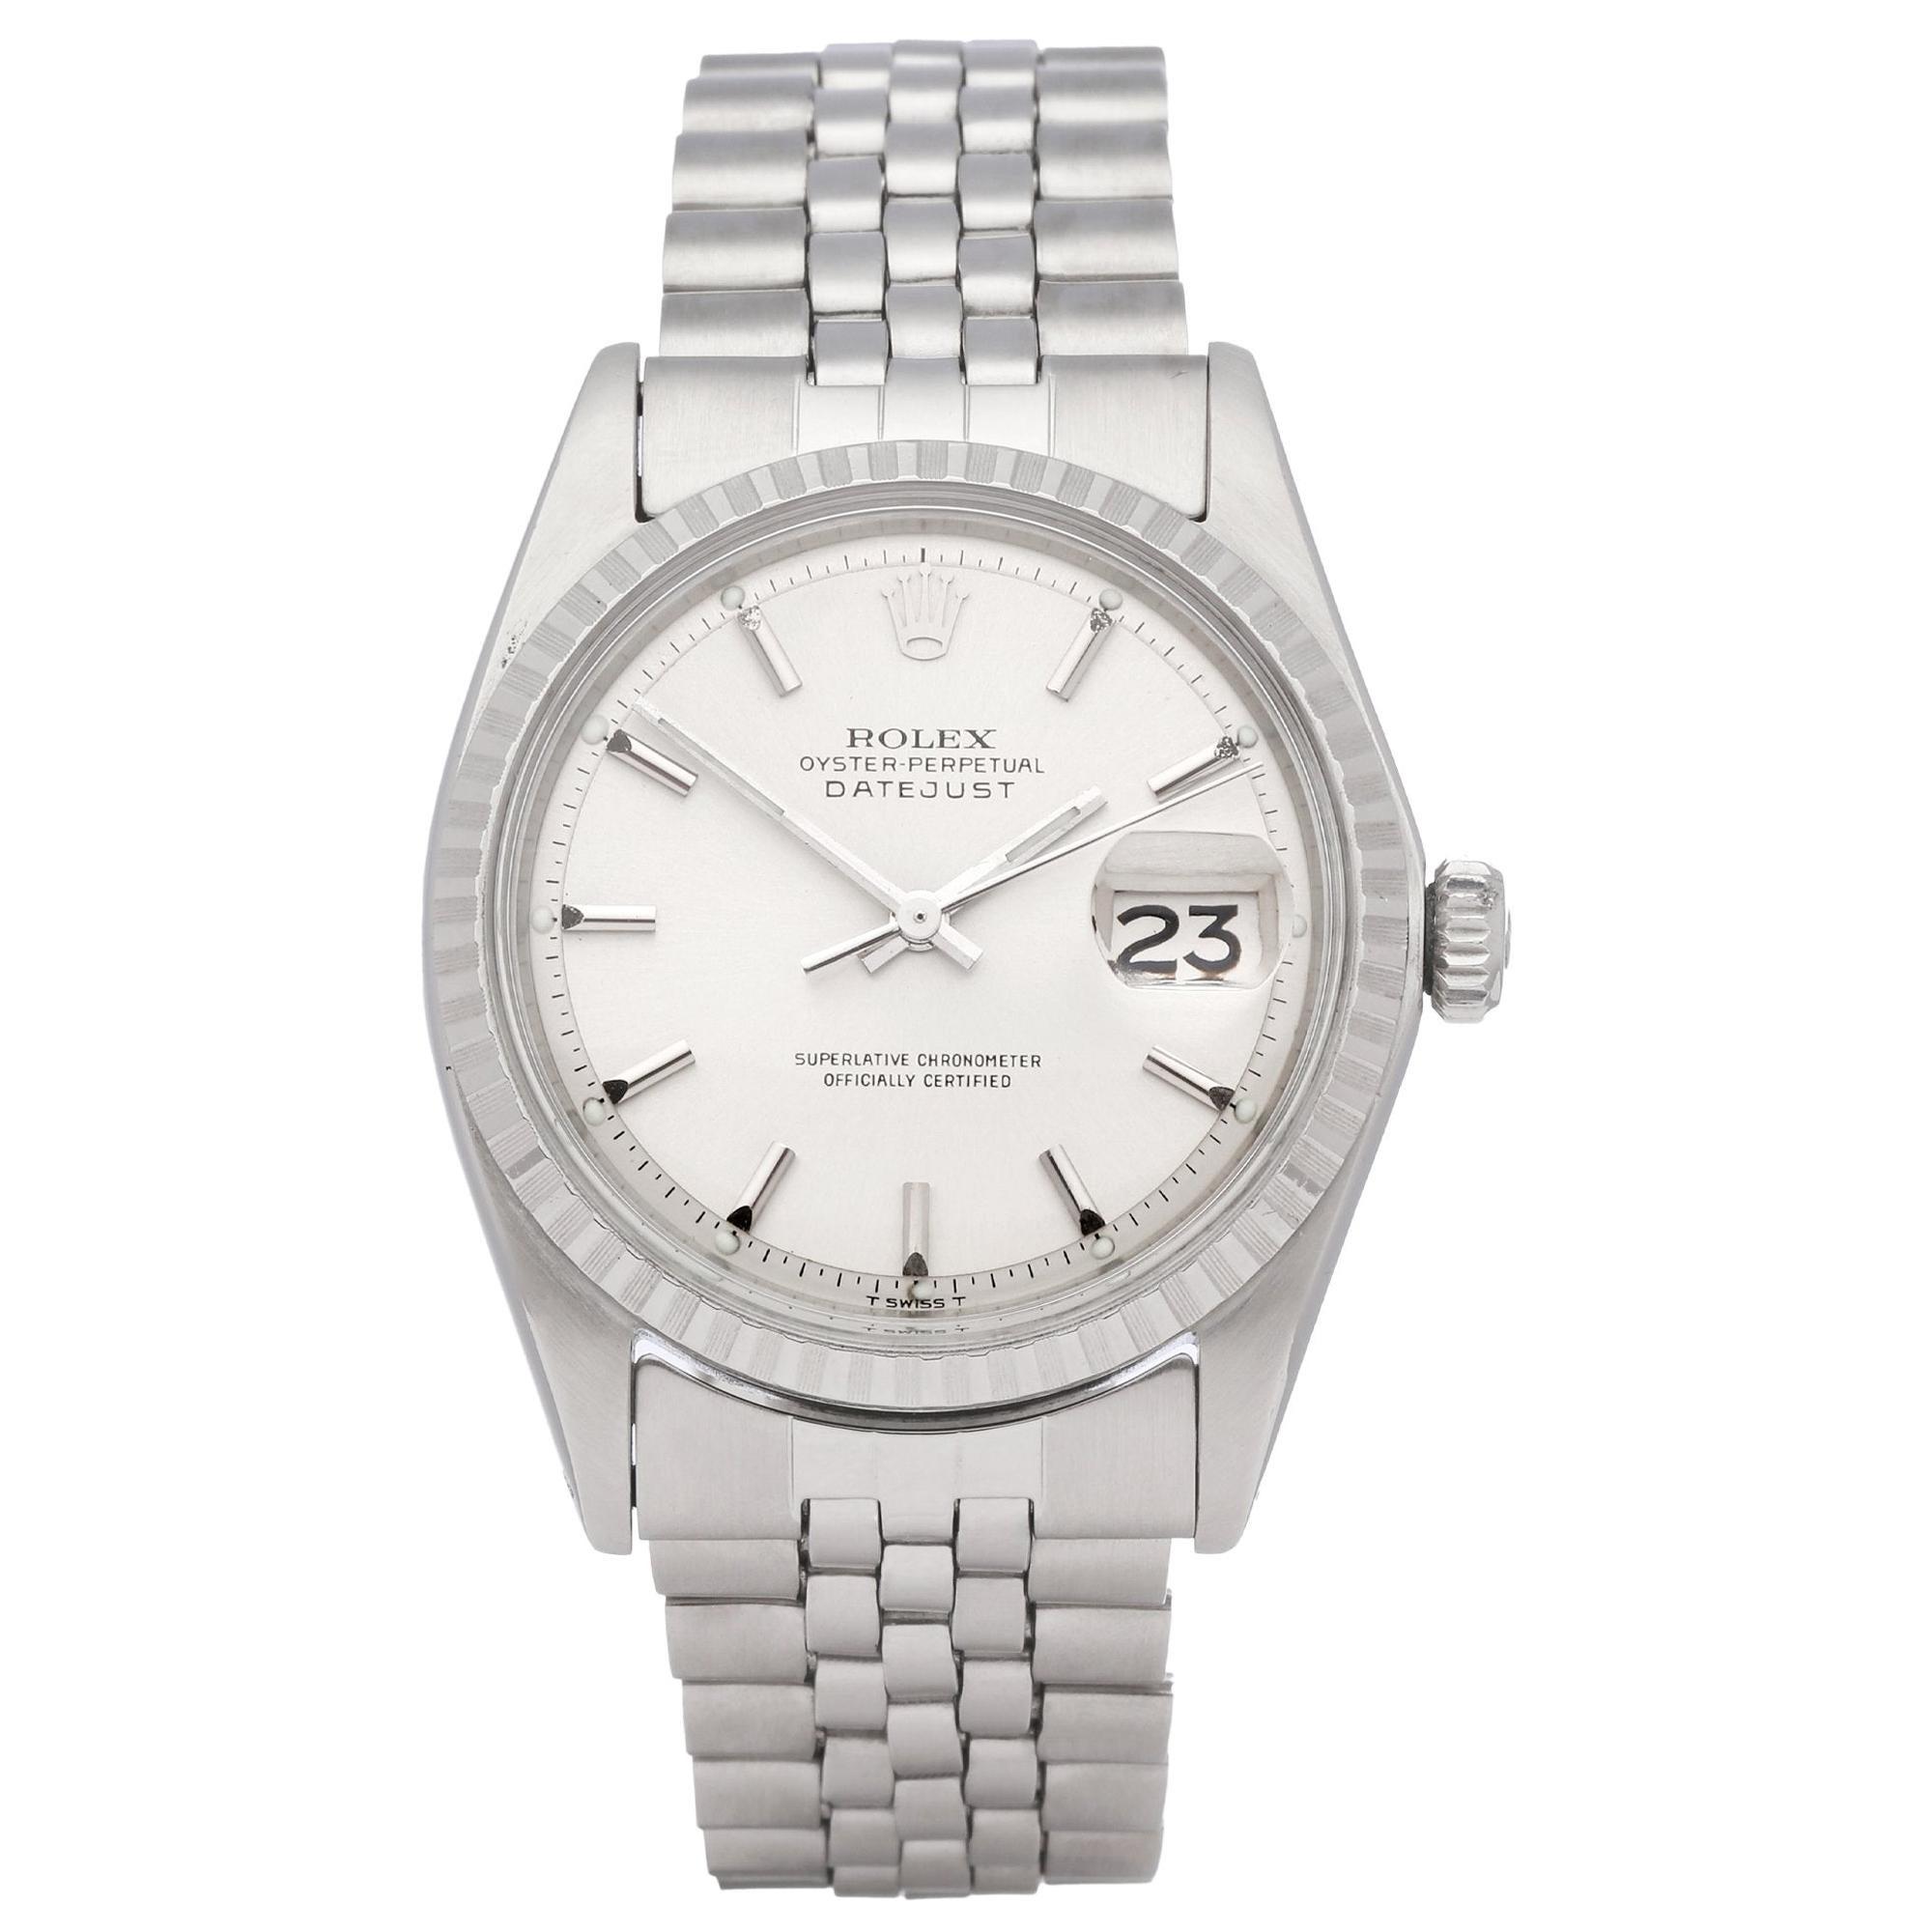 Rolex Datejust 36 1603 Men's White Gold & Stainless Steel 0 Watch